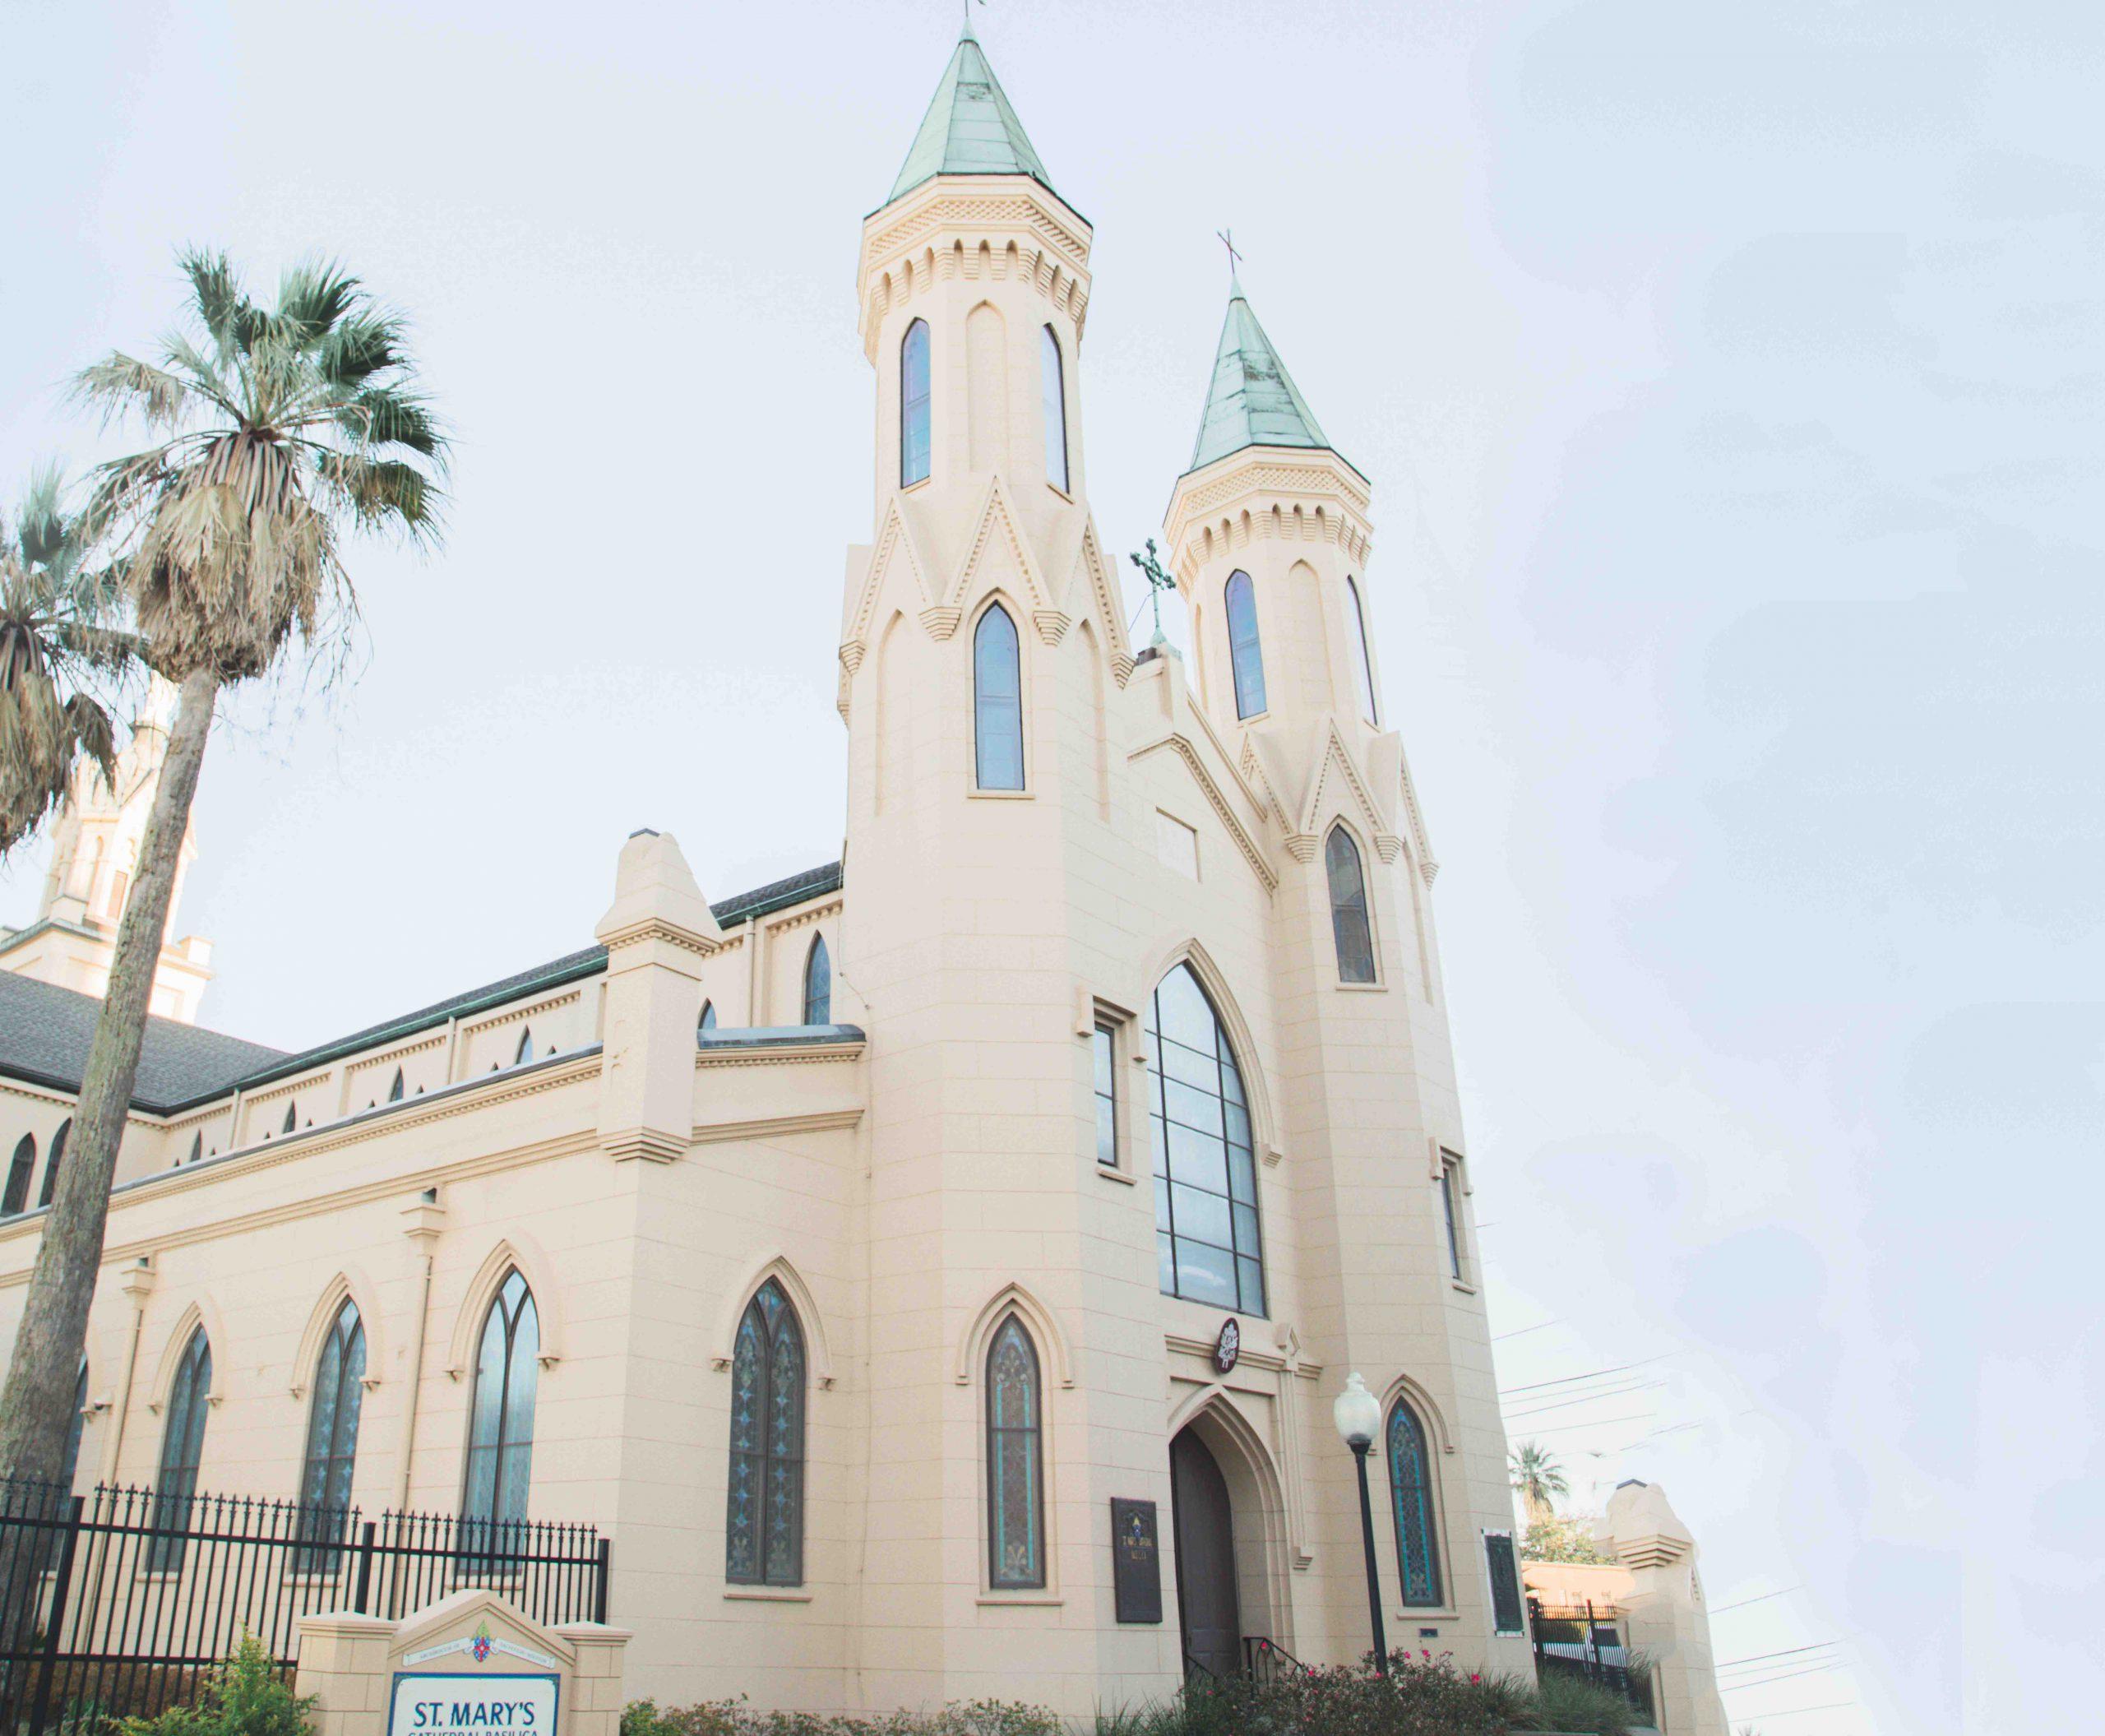 St Marys Basilica in Galveston 2018